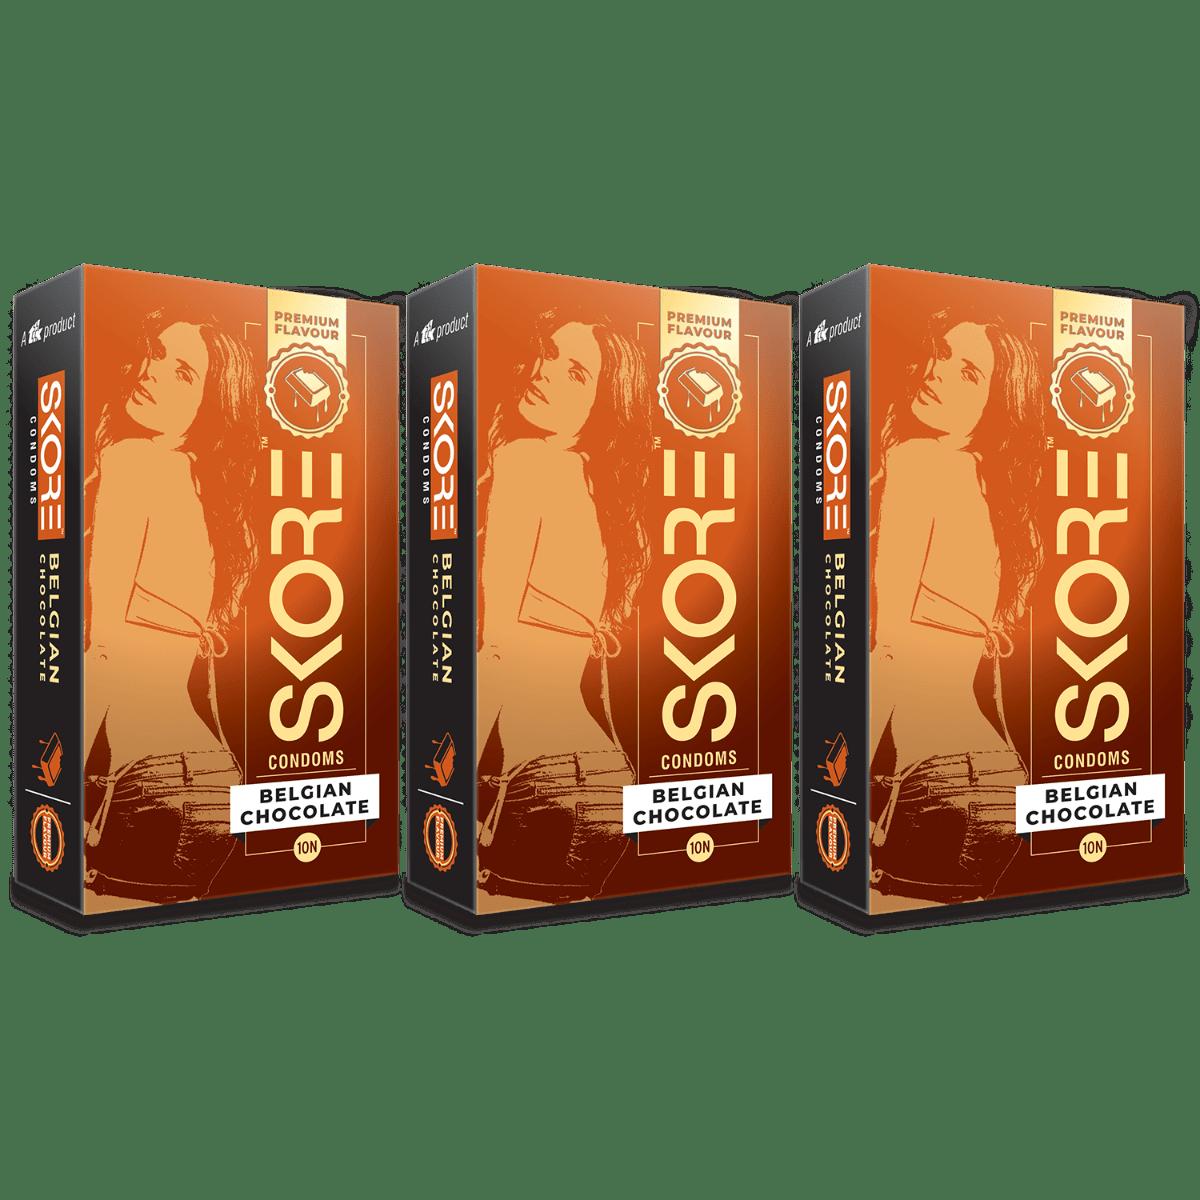 https://www.skorecondoms.com/pub/media/catalog/product/s/k/skore_belgian_combo-min_1_1.png